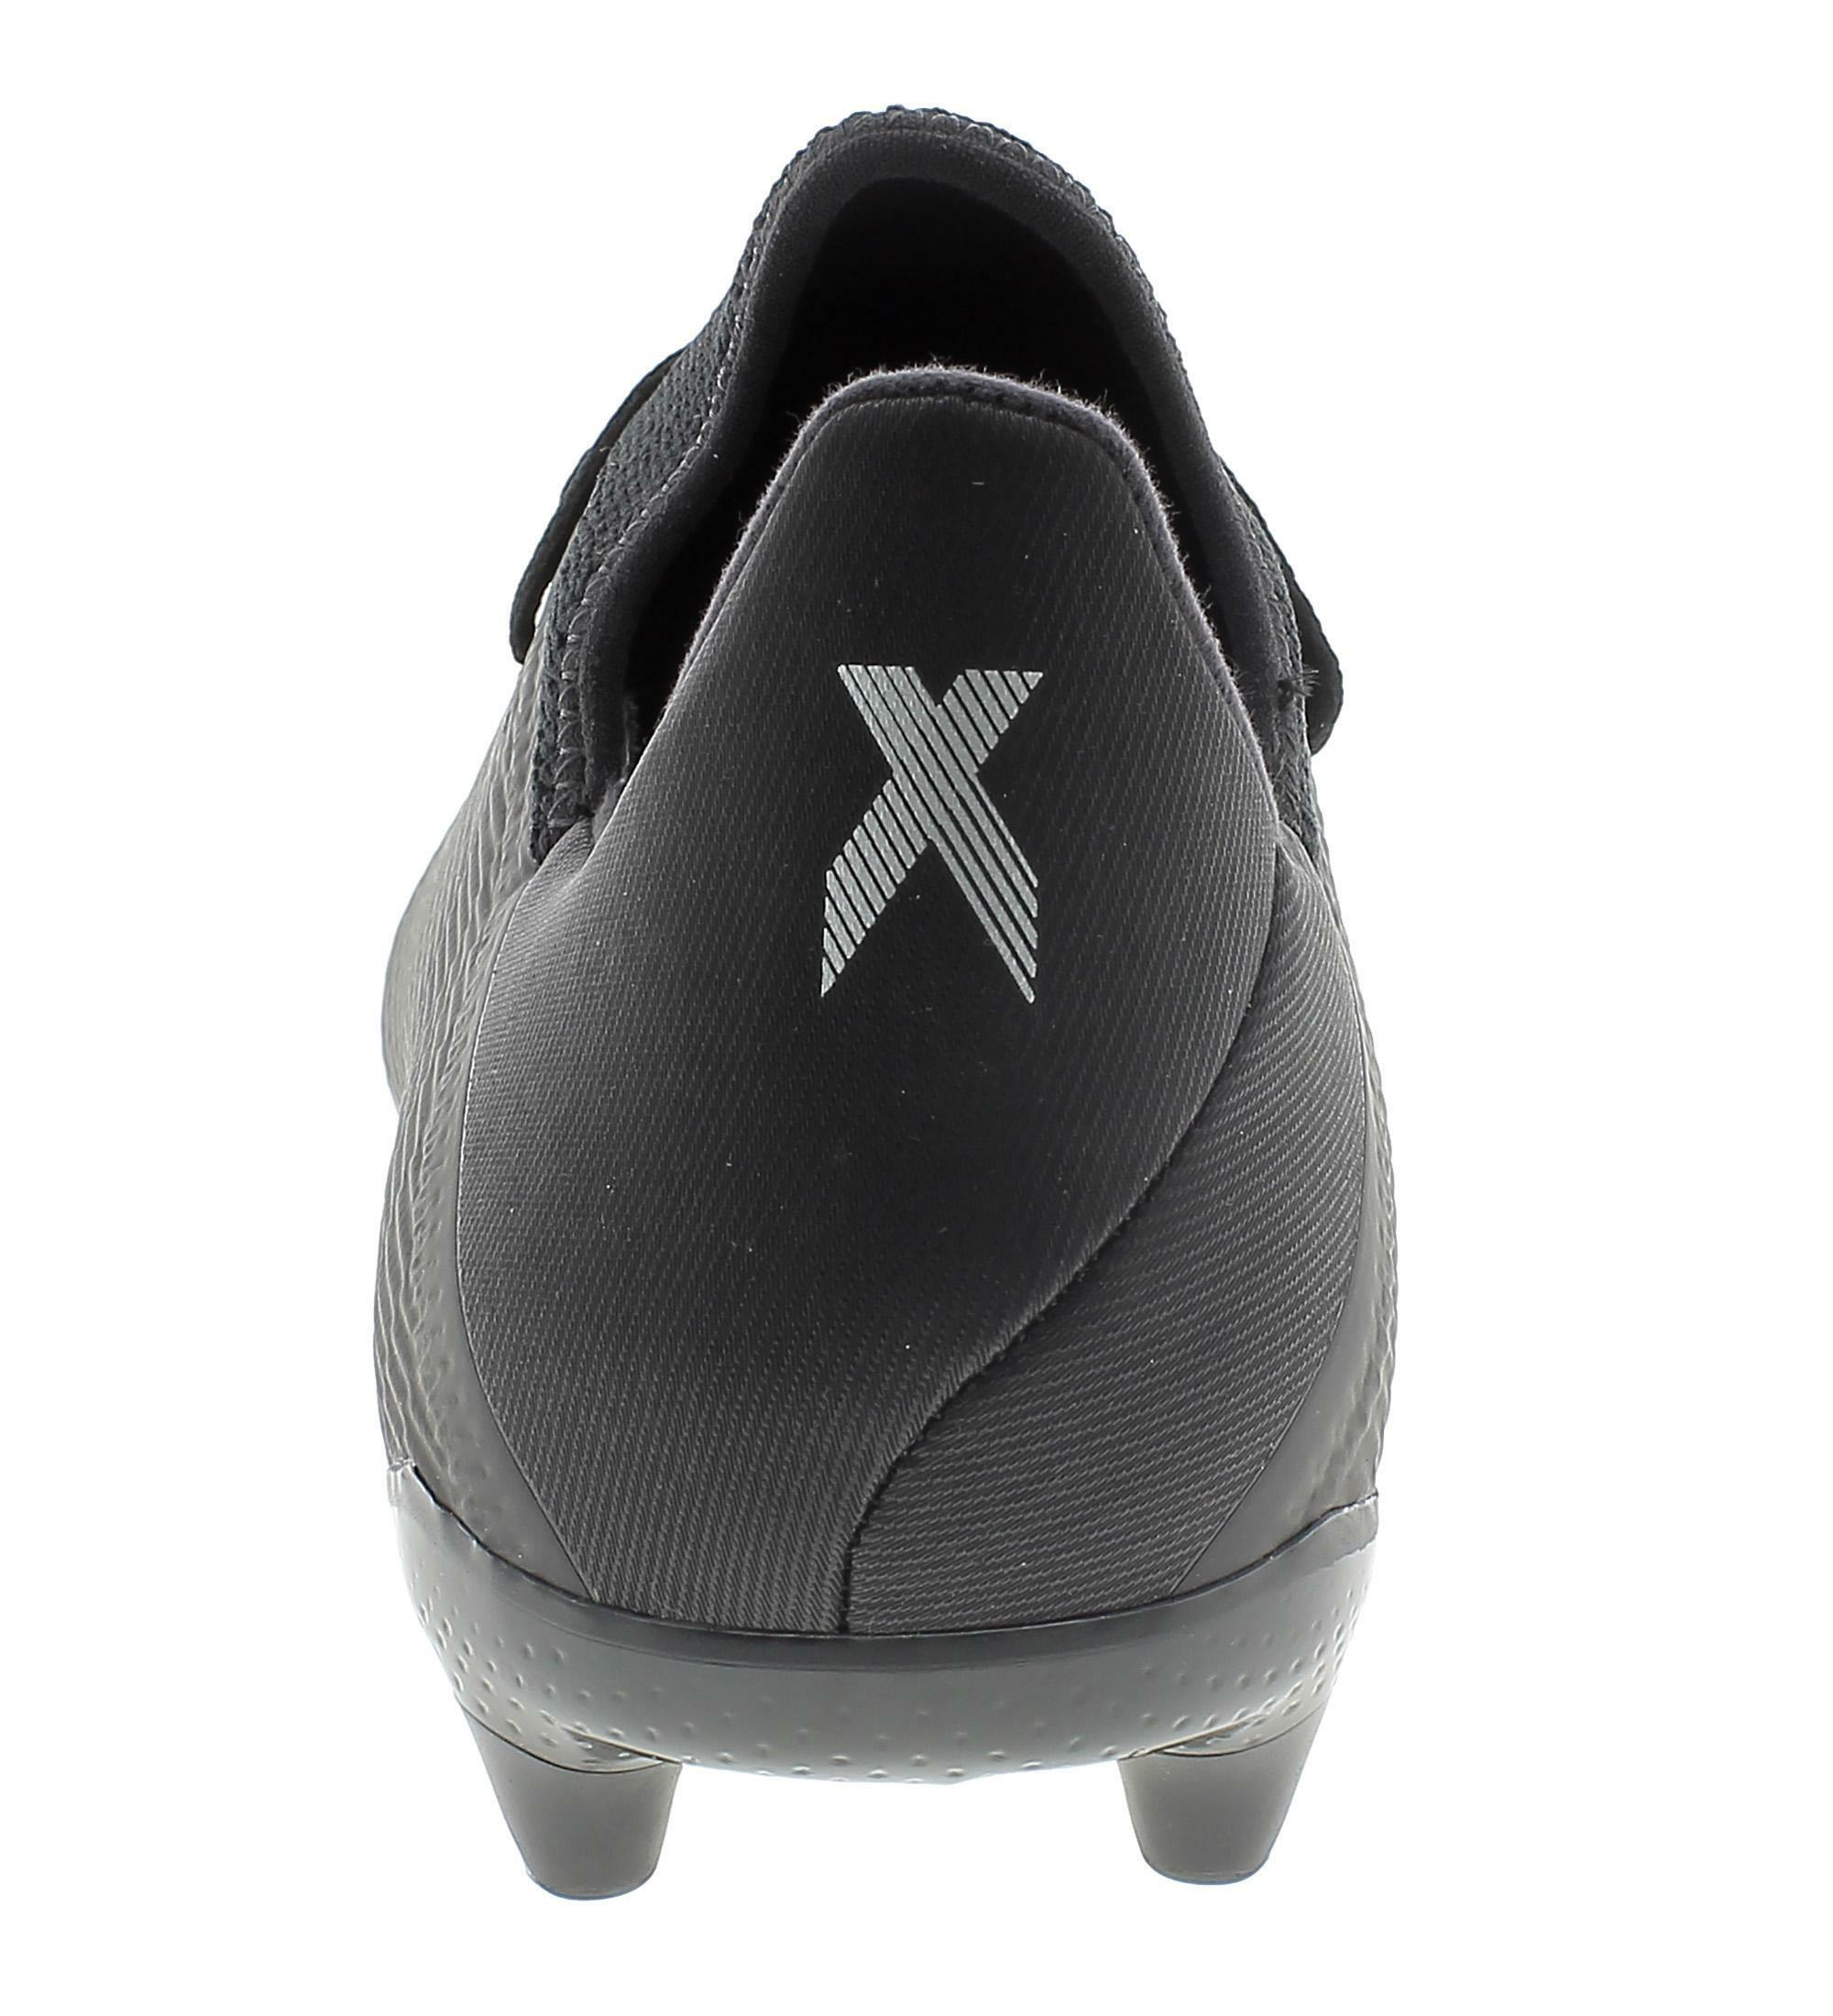 adidas x 19.3 fg scarpini calcio uomo neri f35381